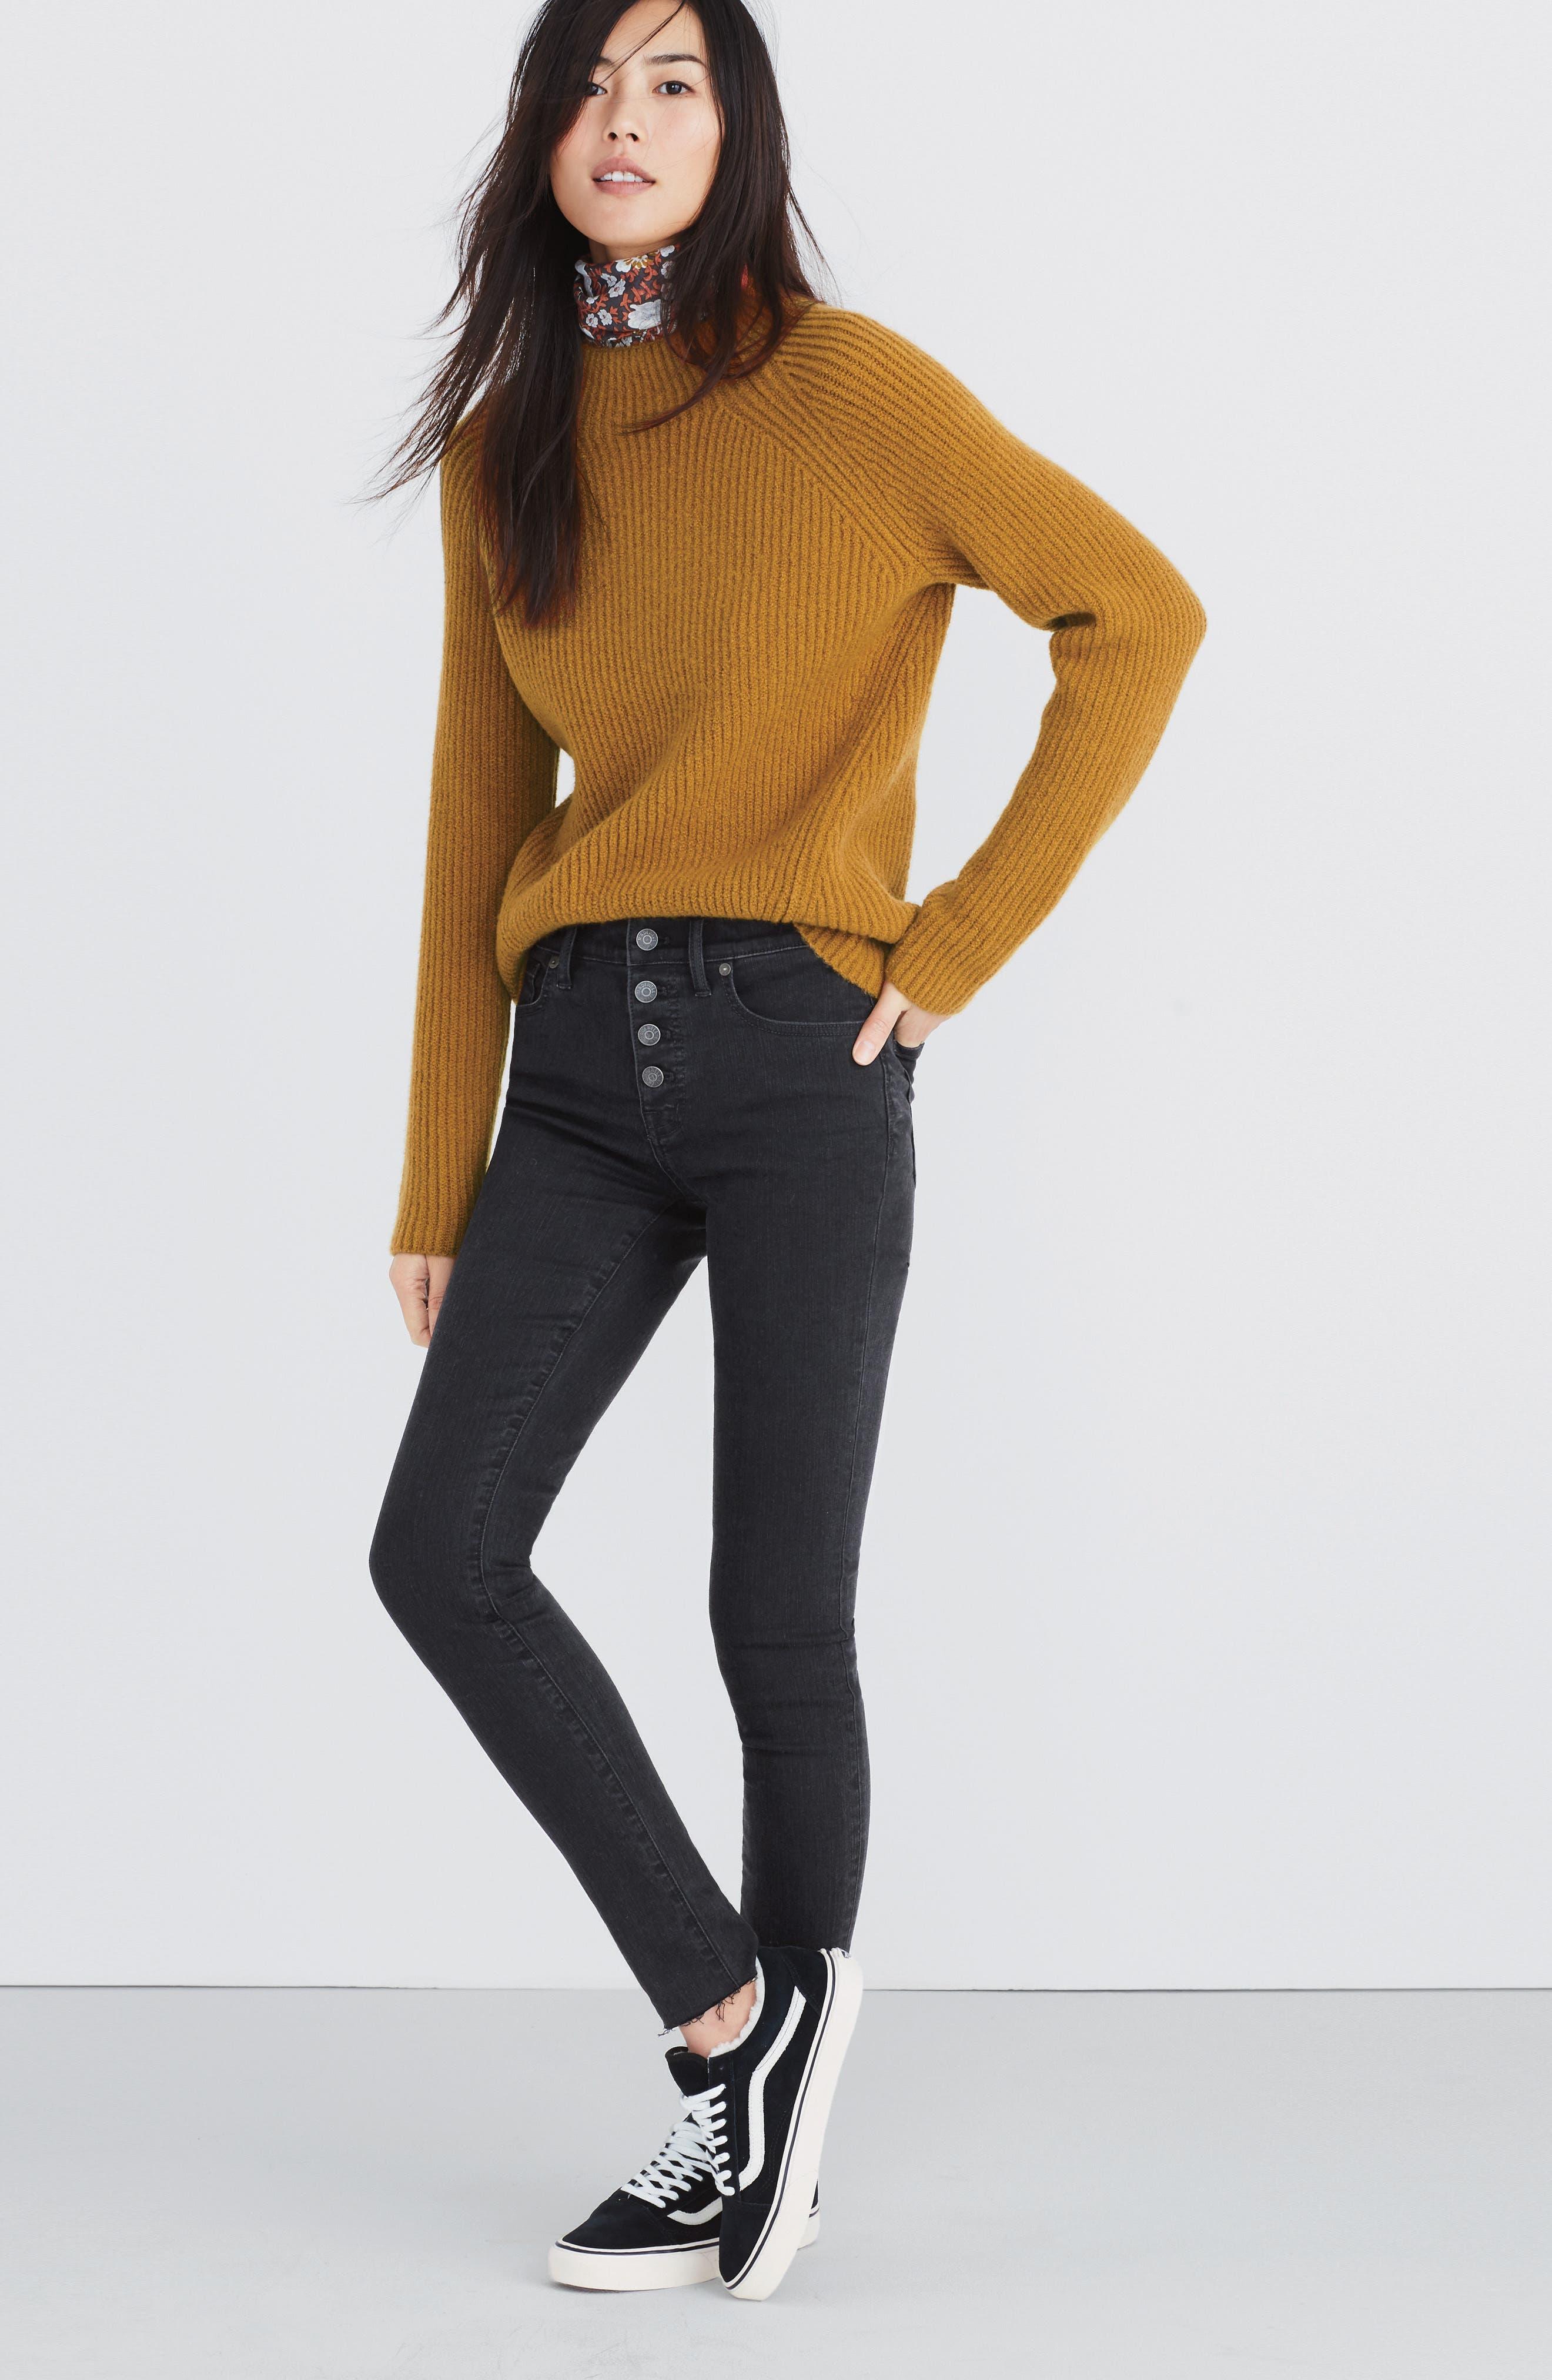 MADEWELL, Northfield Mock Neck Sweater, Alternate thumbnail 5, color, 800